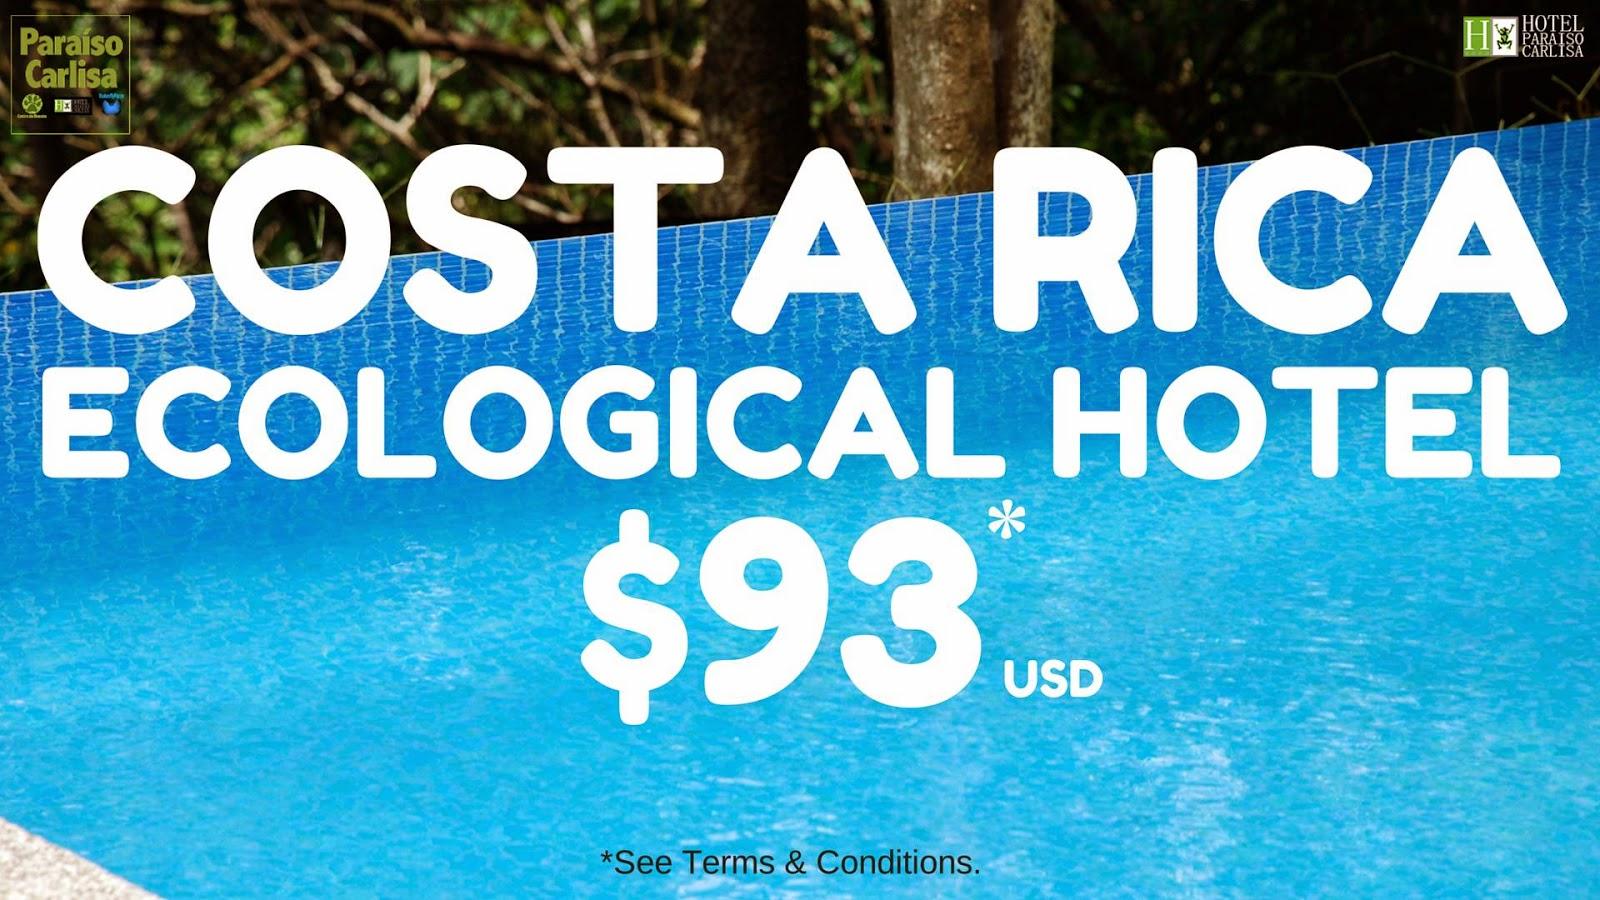 www.hotelparaisocarlisa.com